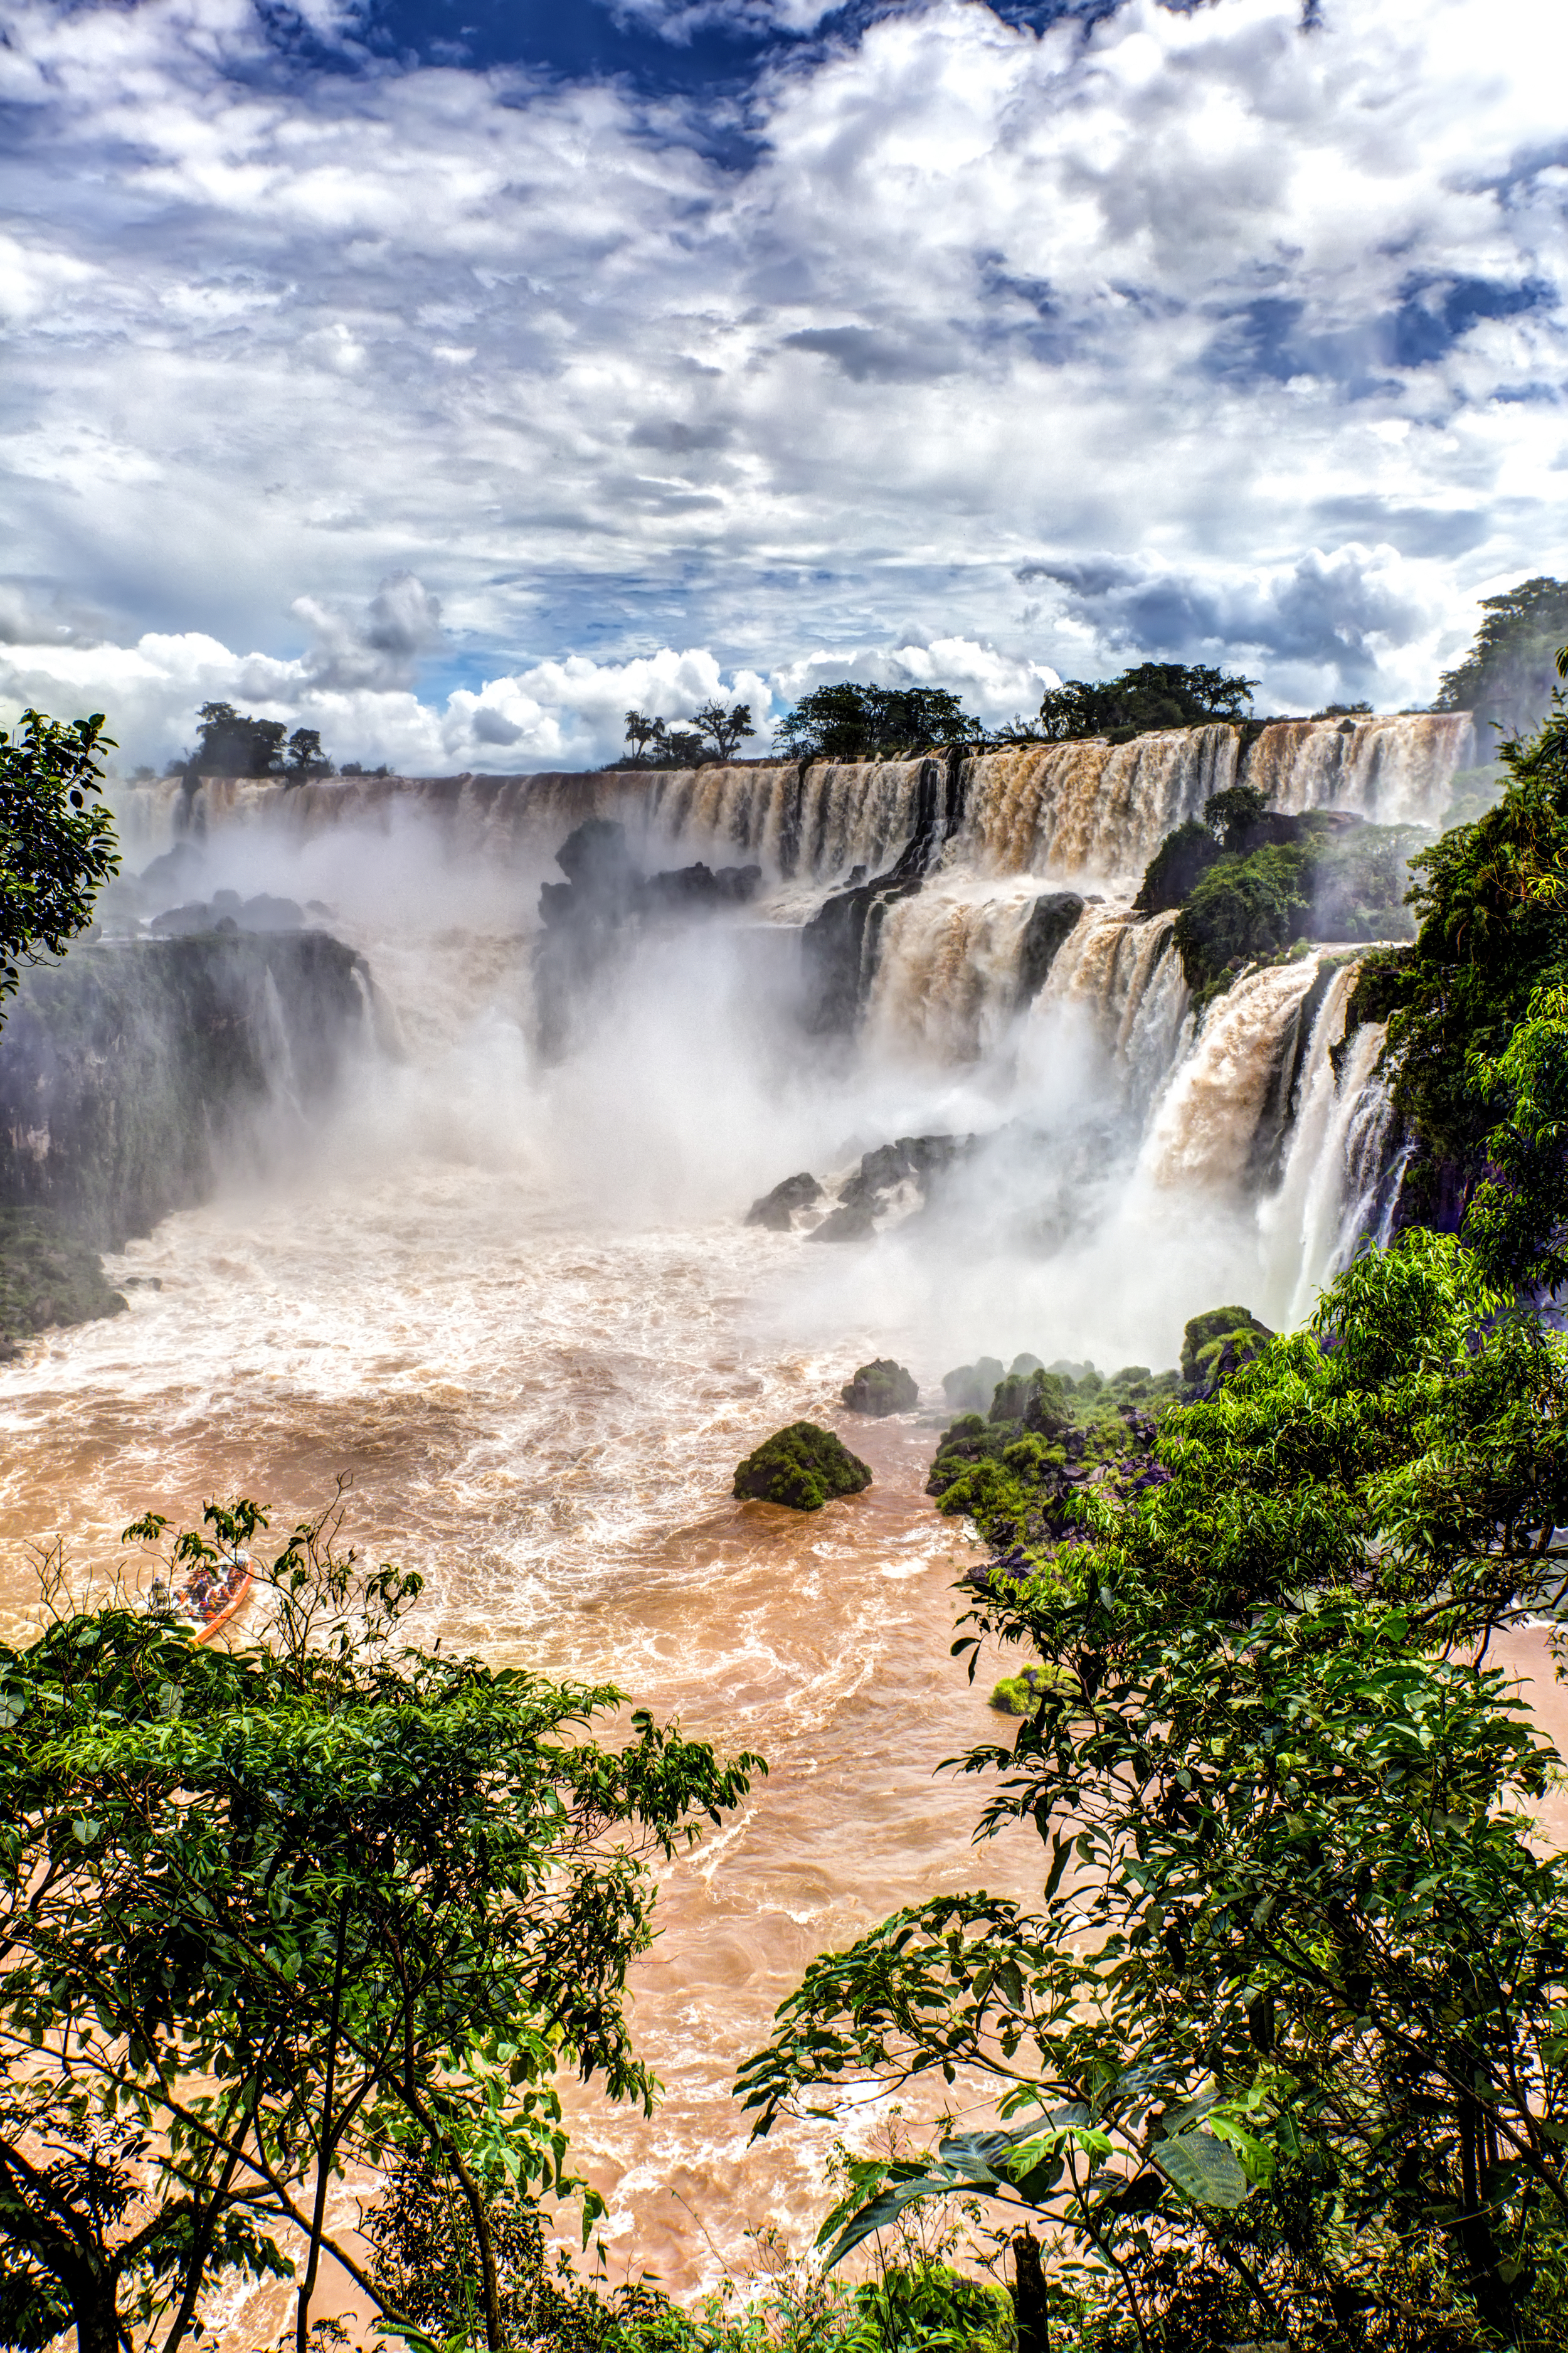 The Curve Of Iguazu Falls